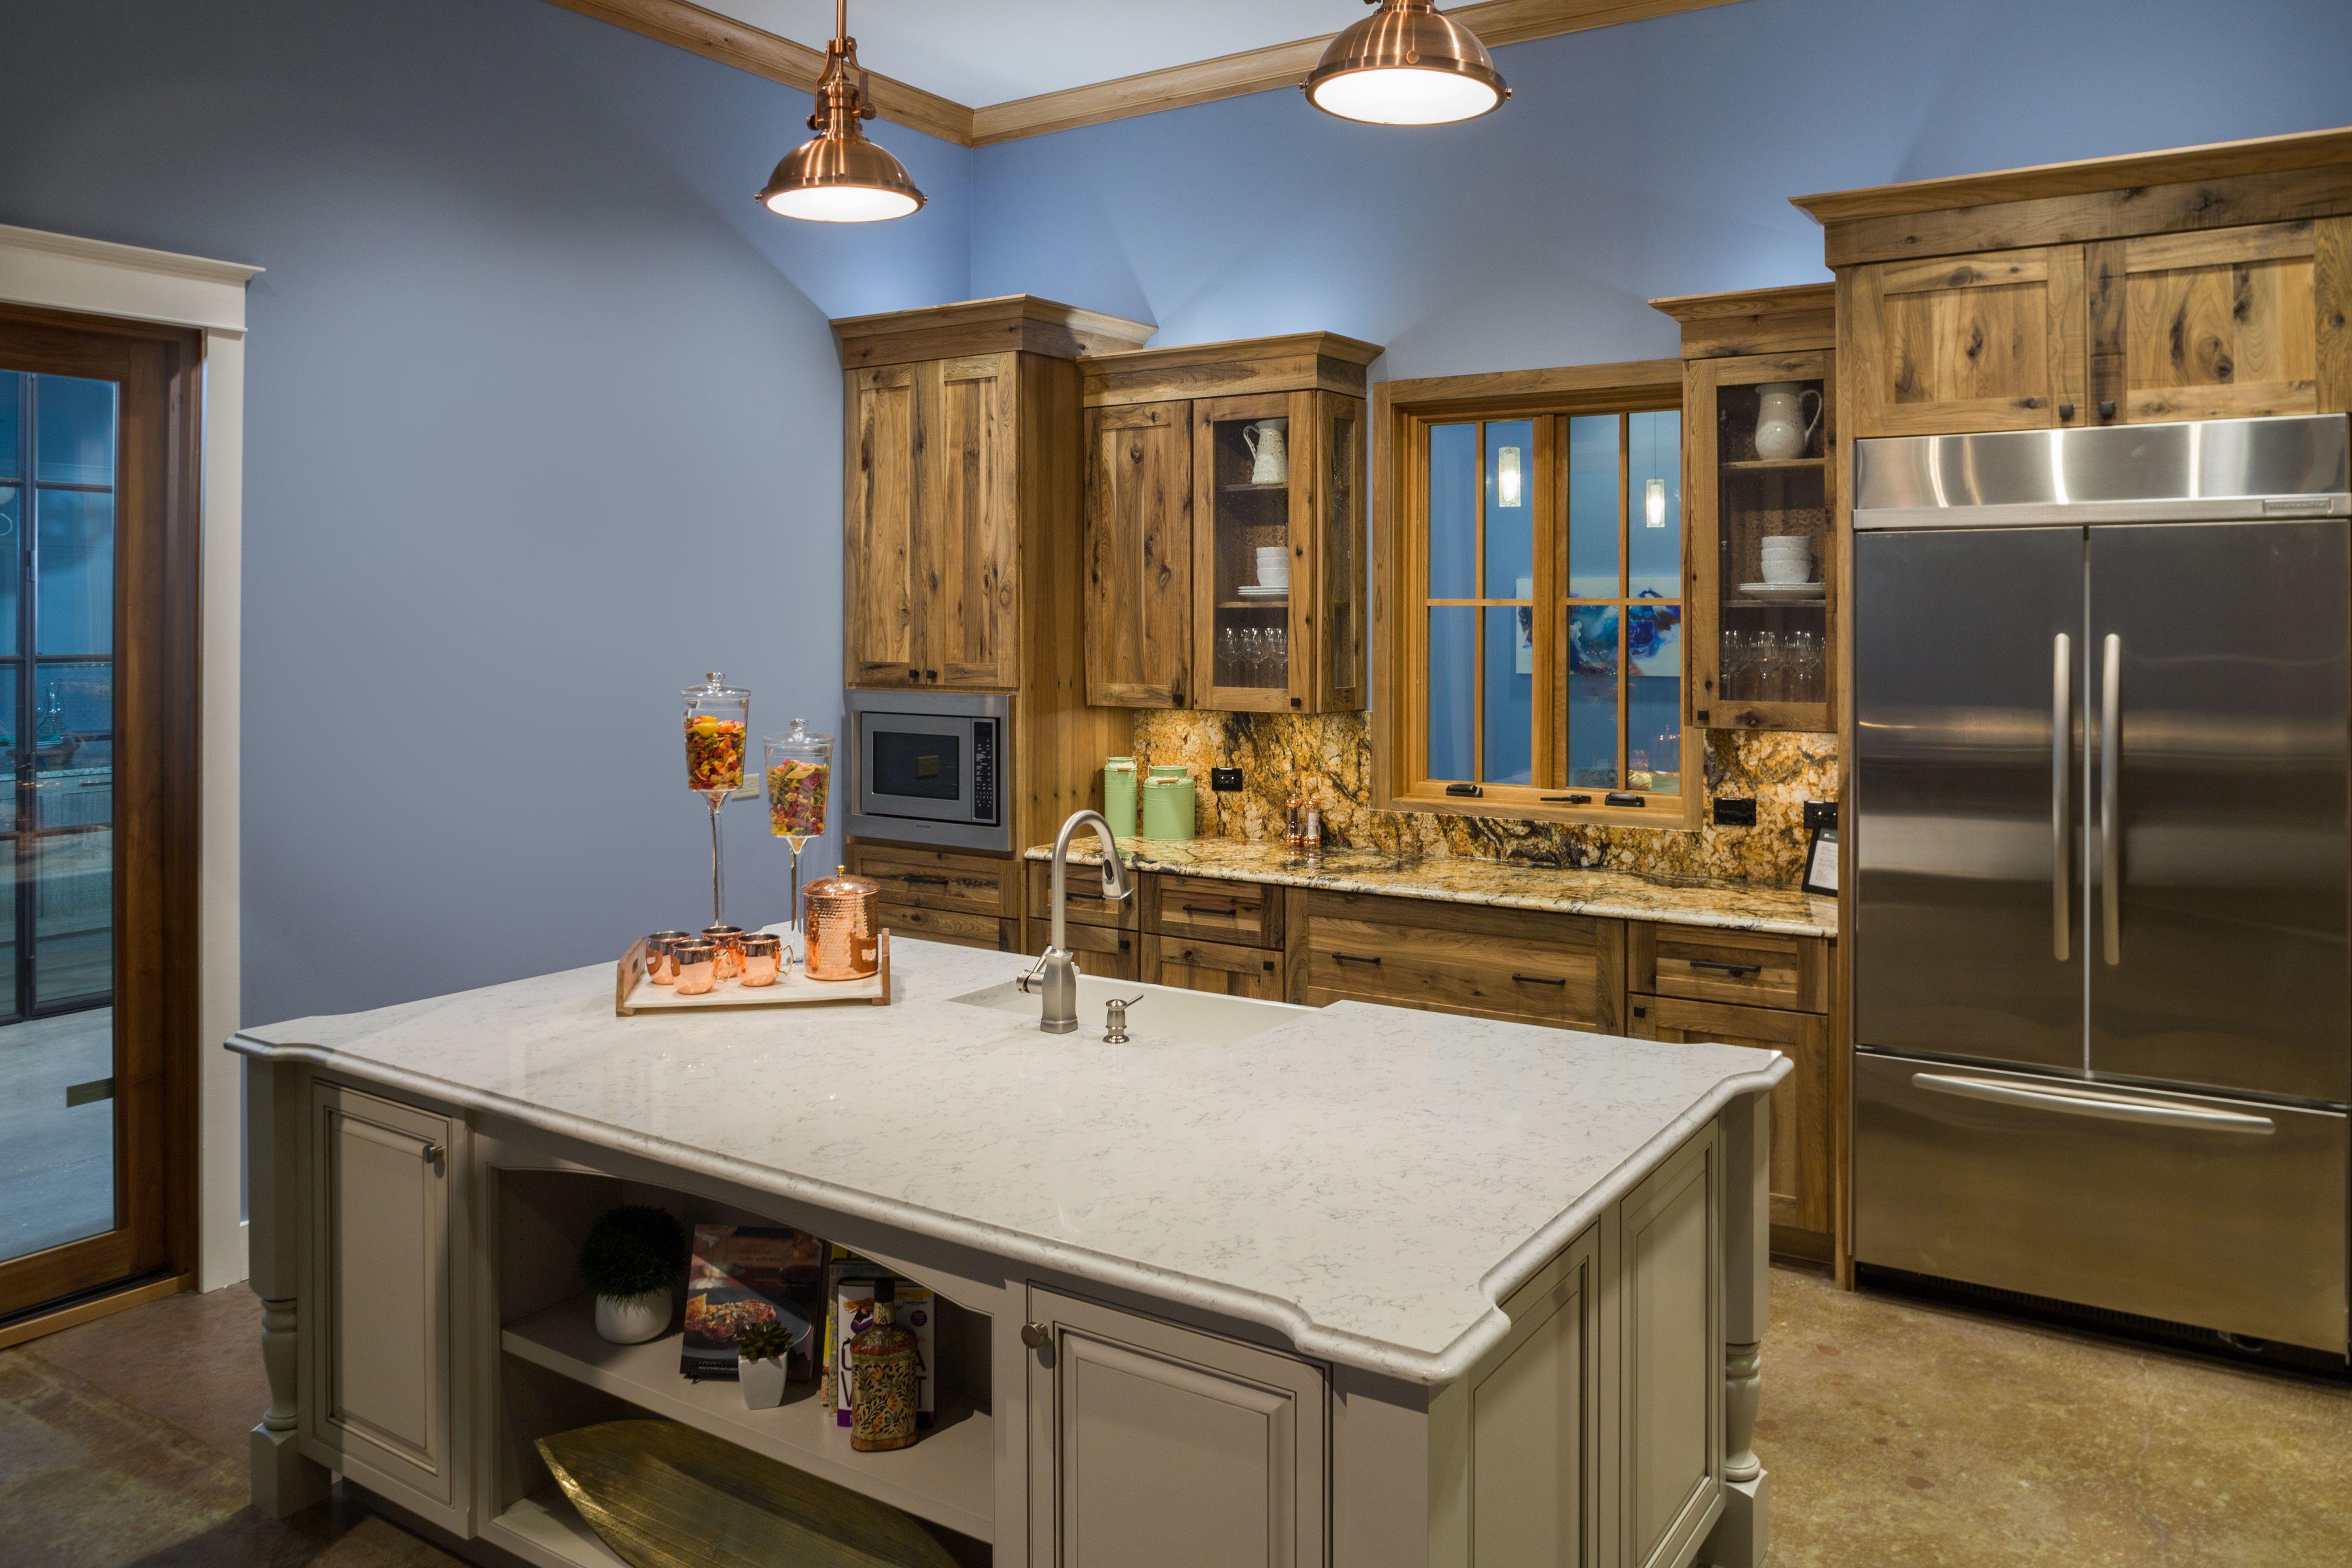 Rustic Kitchen Inspiration Bmc Design Center Home Design Magazines Showroom Design Kitchen Inspirations